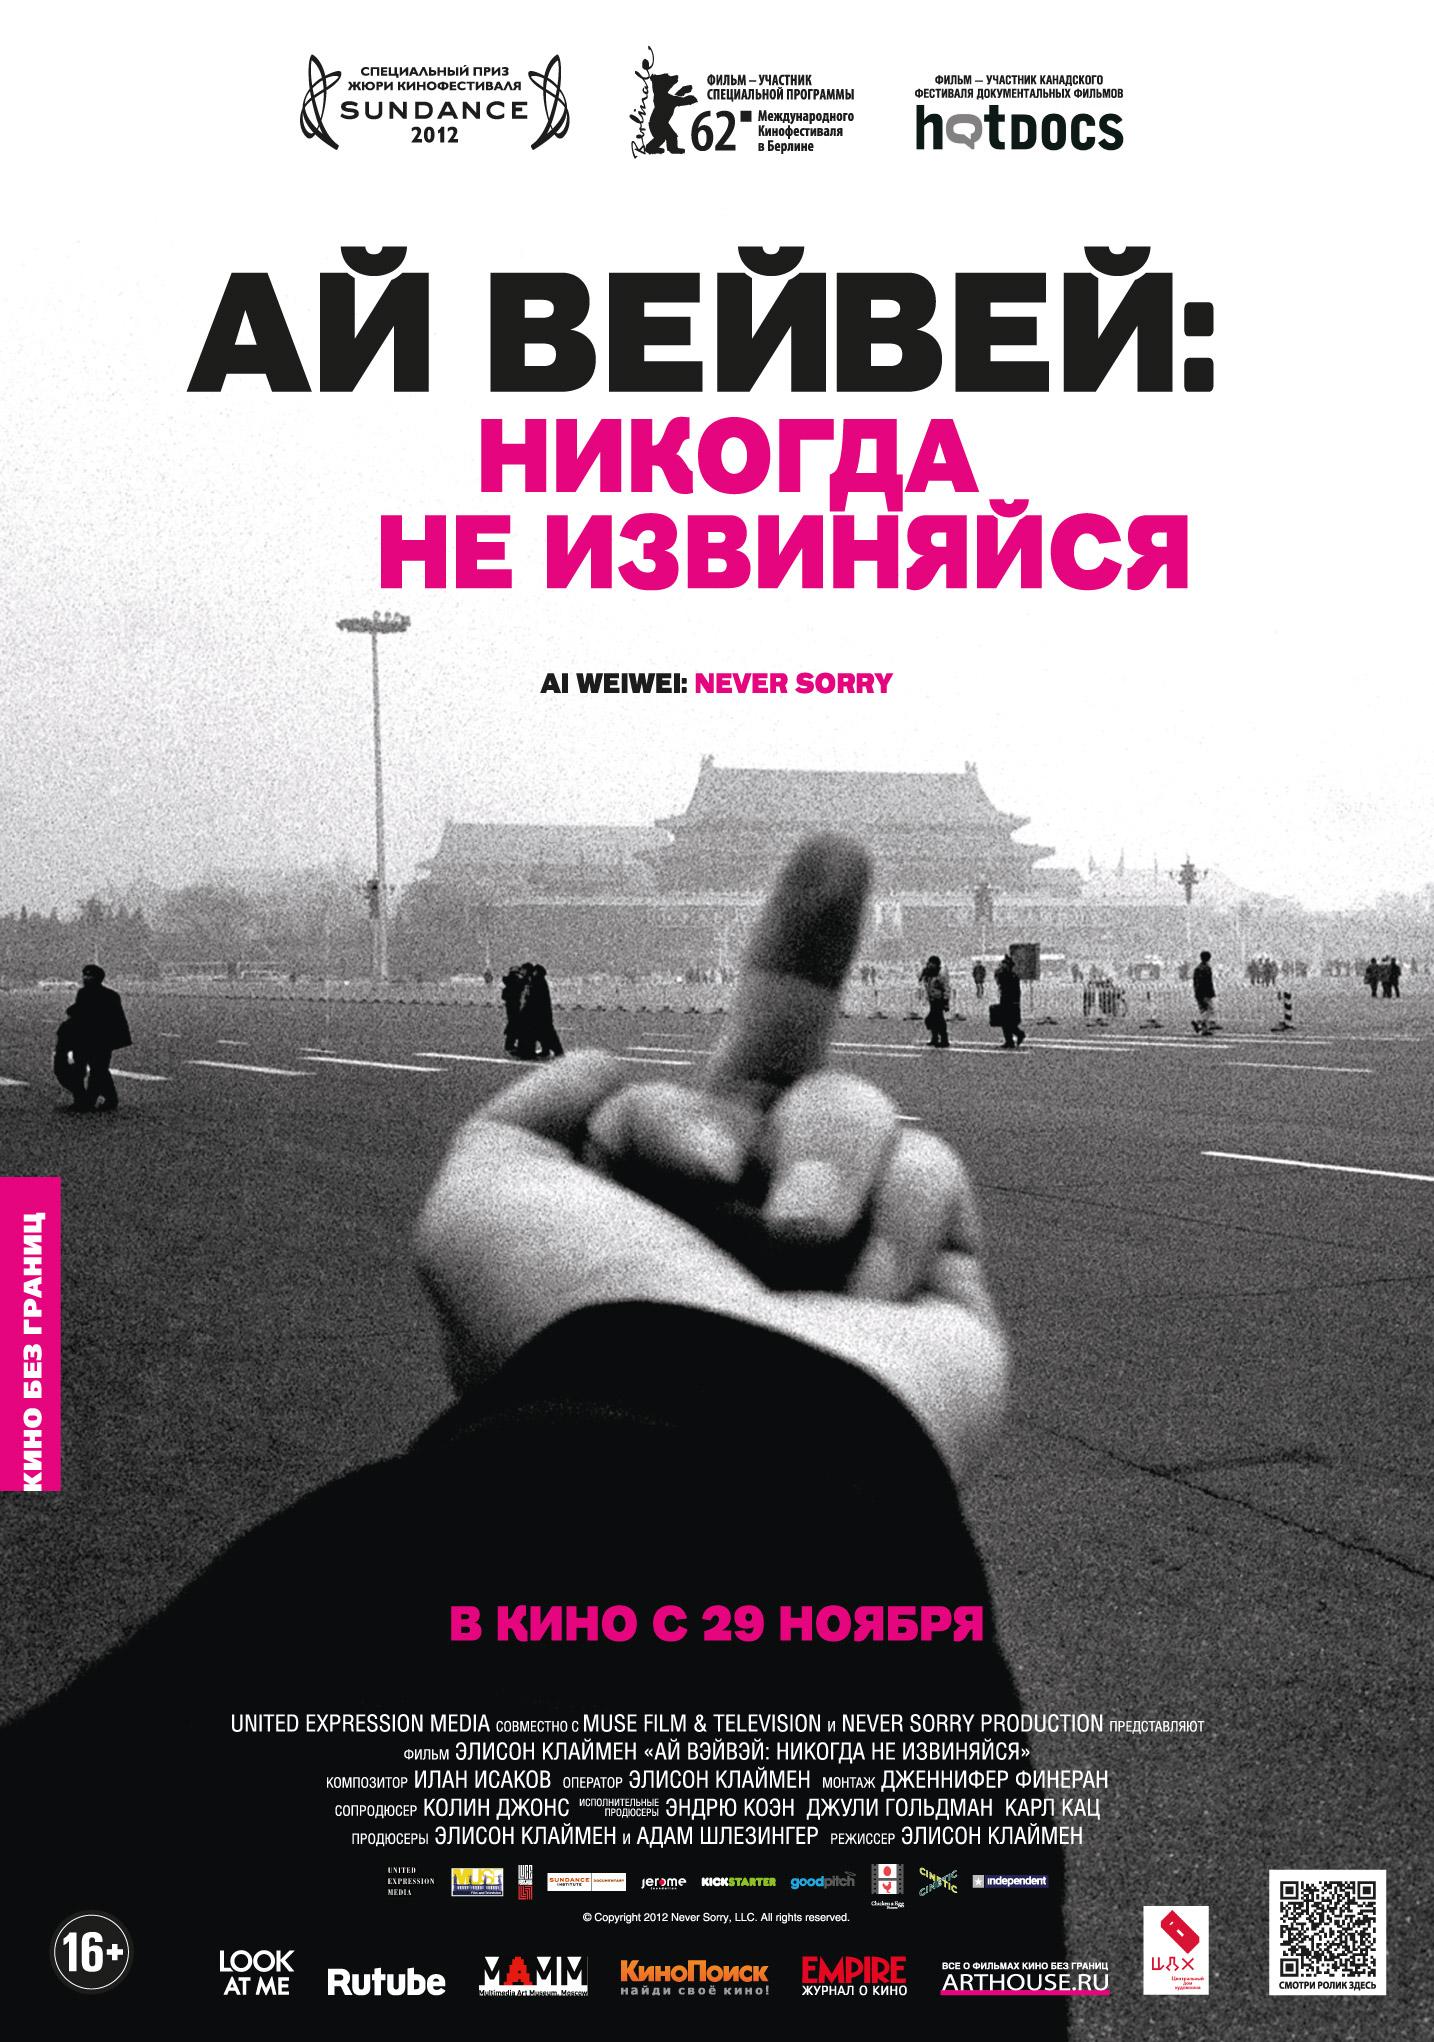 Russia aiweiwei_poster_700x1000_preview.jpg